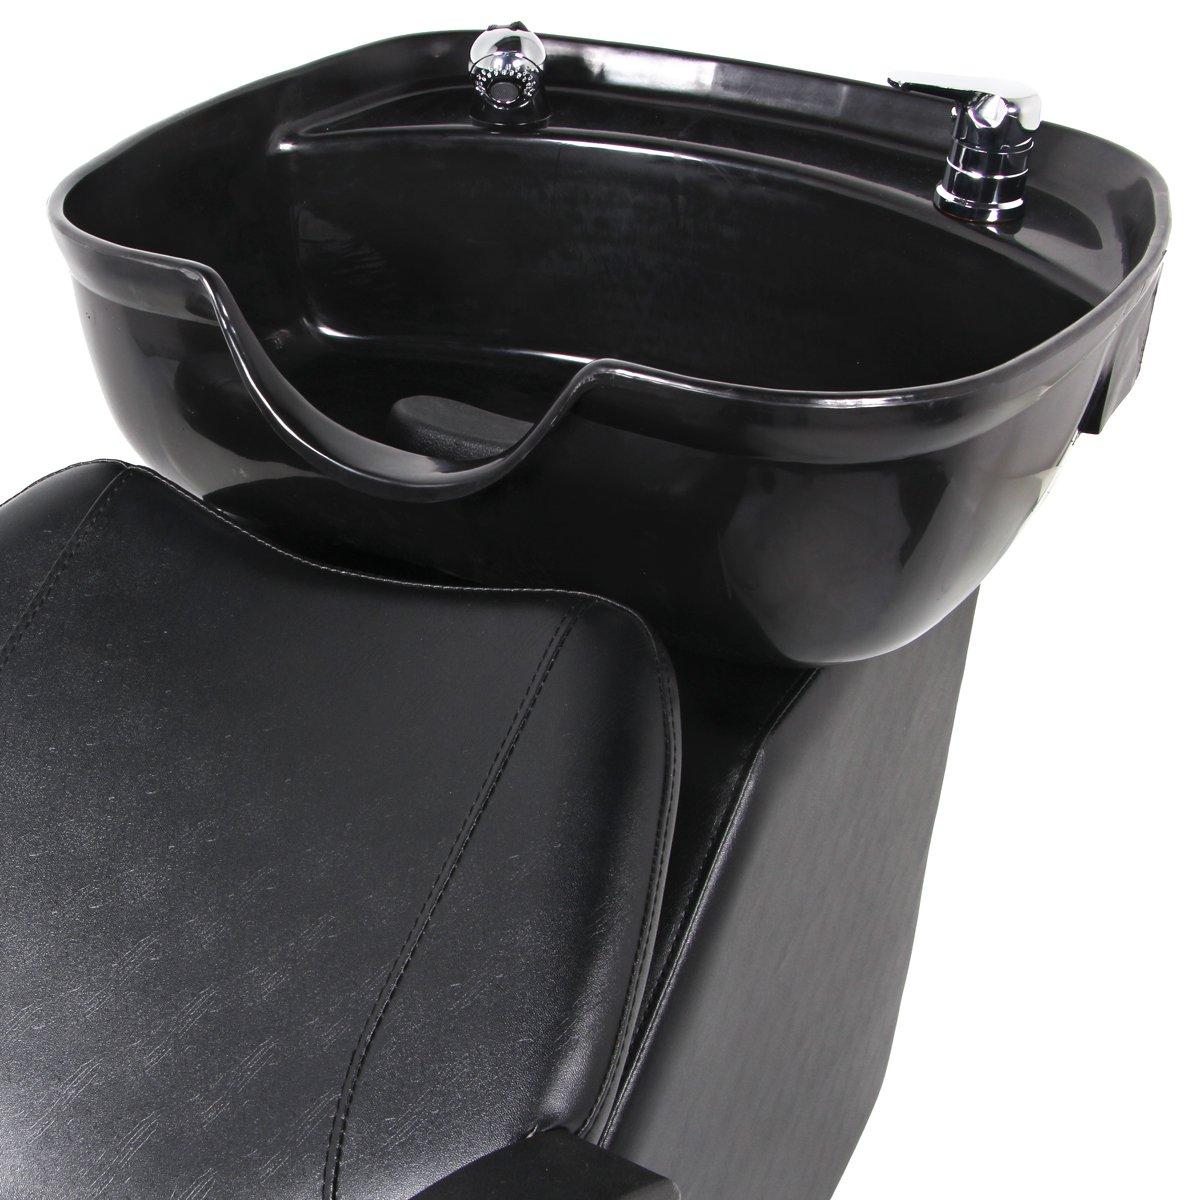 Esright Salon Bowl Shampoo Sink Backwash Chair Barber Beauty Spa Equipment Black (Basic)